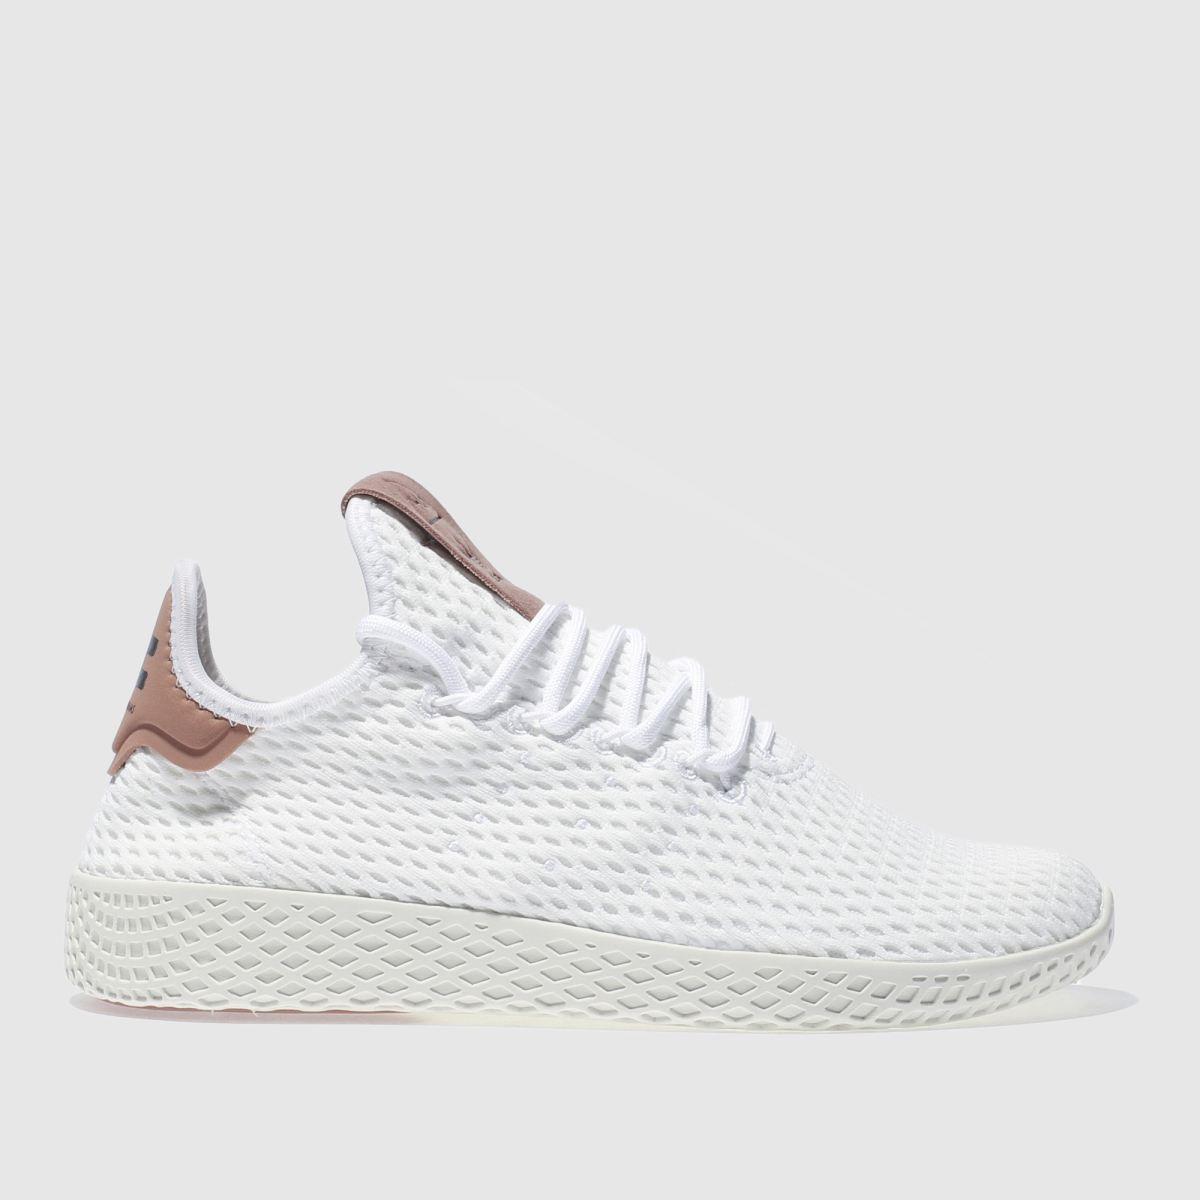 adidas white & pink pharrell williams tennis hu trainers